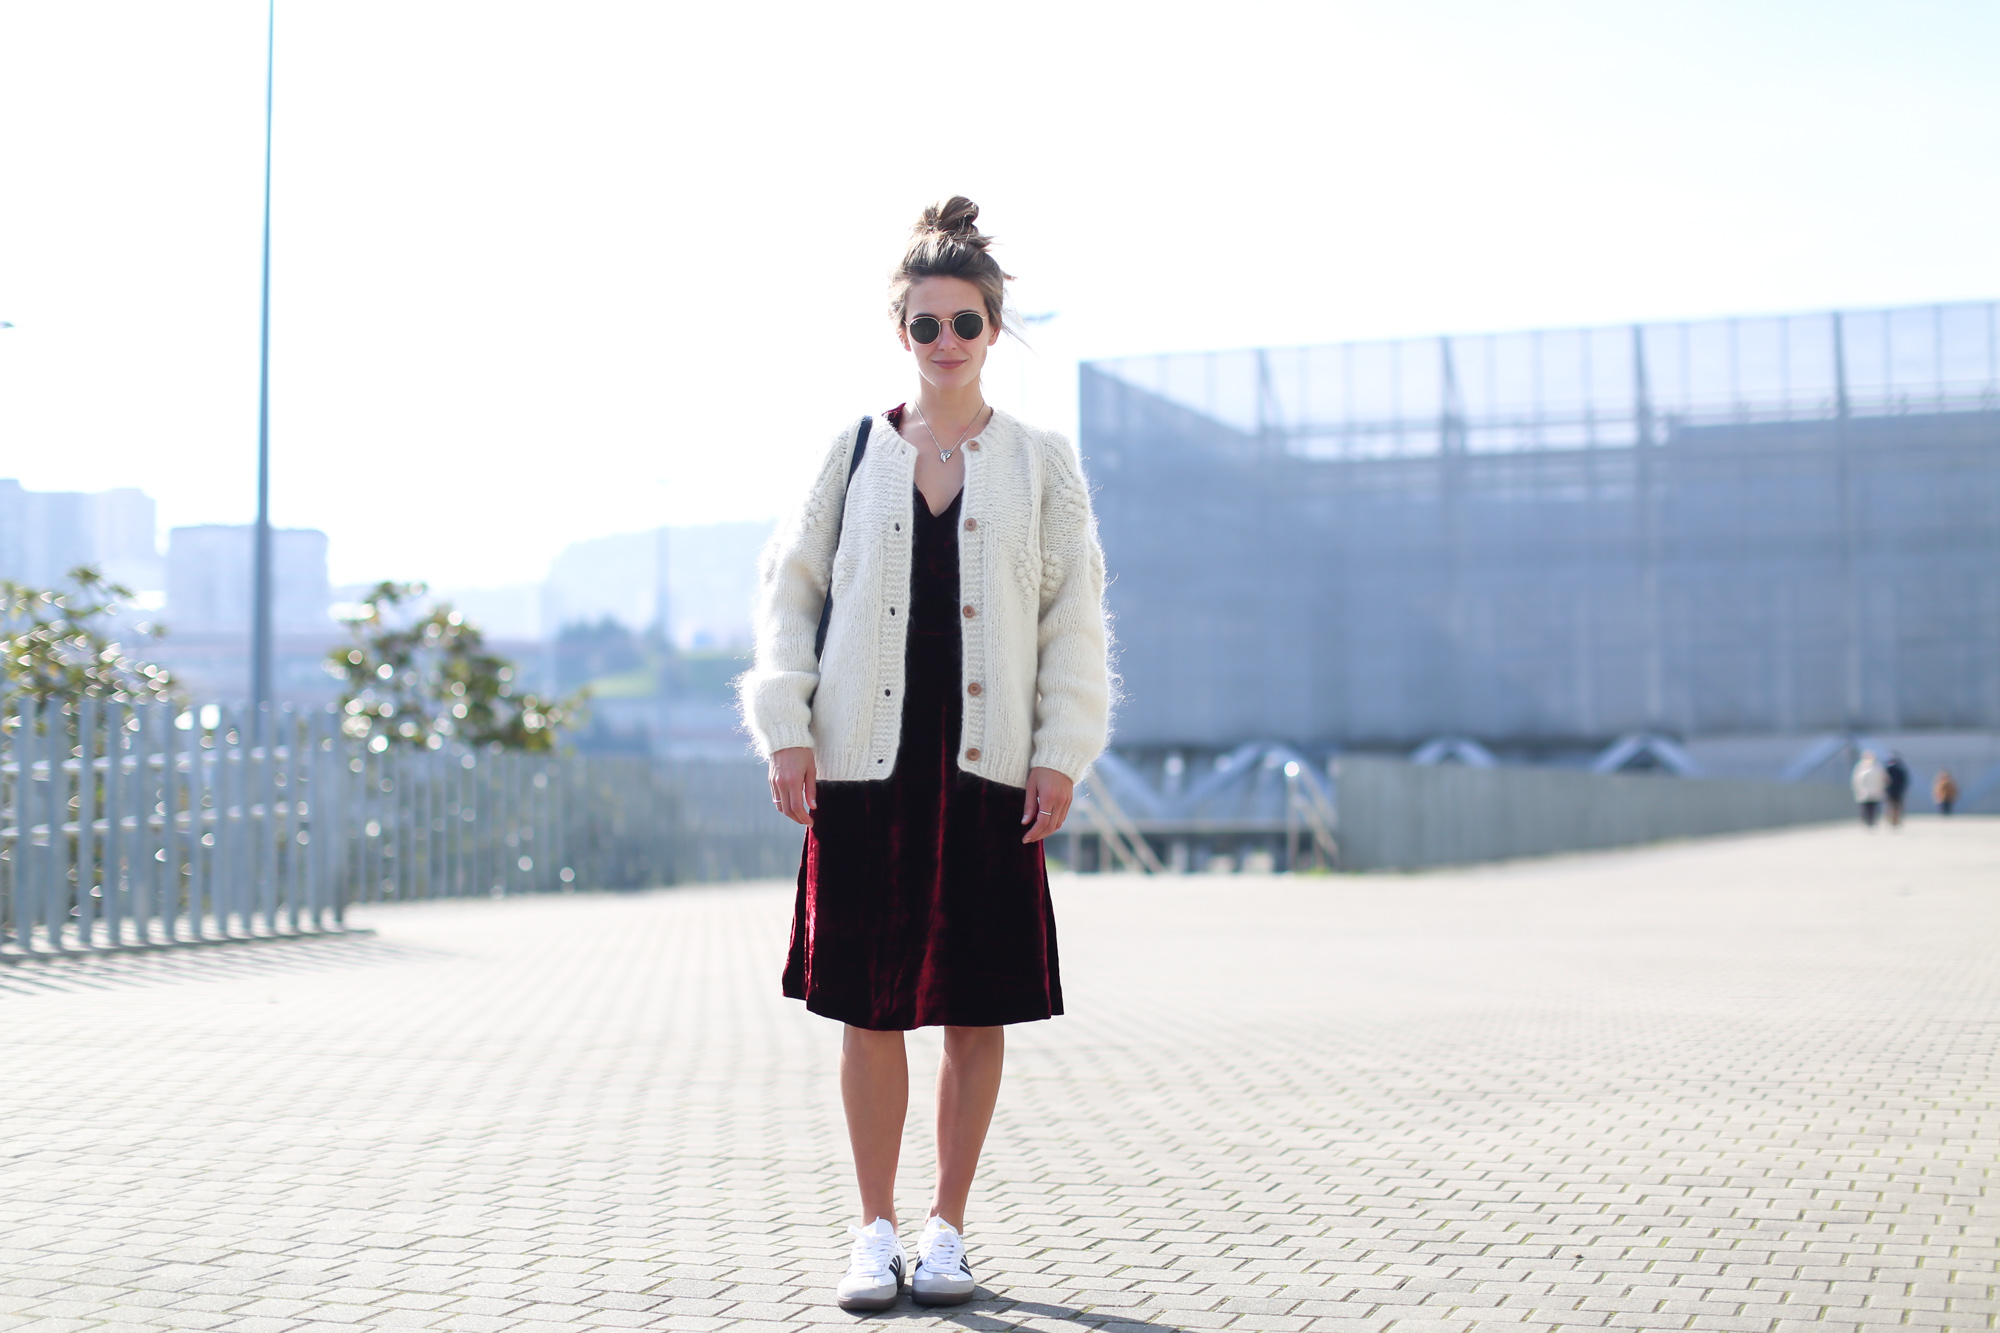 Clochet_streetstyle_fashionblogger_intropia_jerseylanaochosabiertogordito_vestidoterciopelomasscob_adidassambablancas